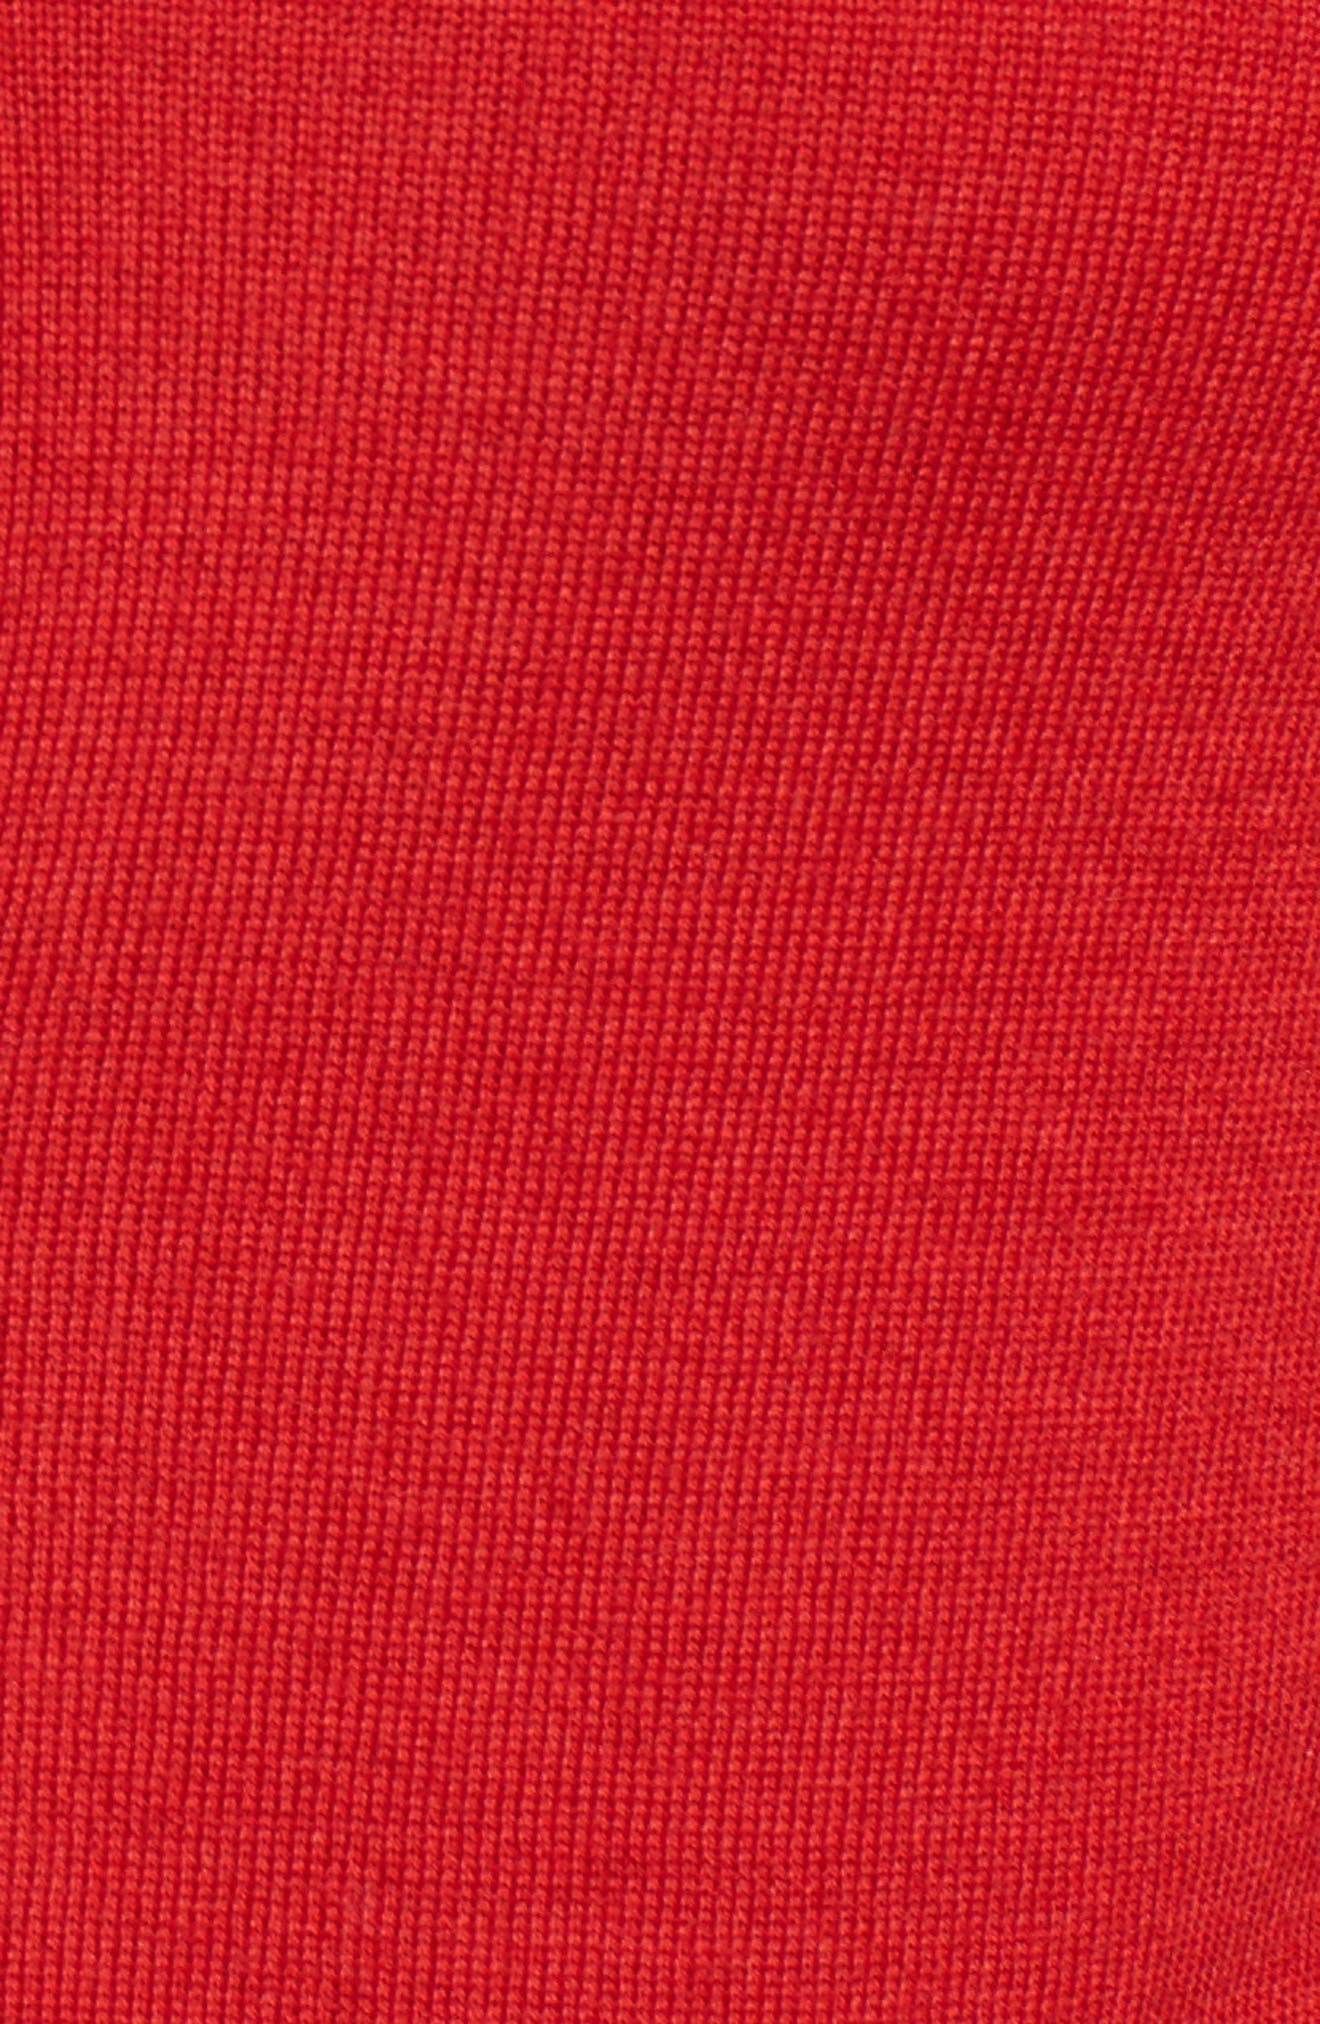 Fuyuma Wool Cardigan,                             Alternate thumbnail 5, color,                             Crimson Red